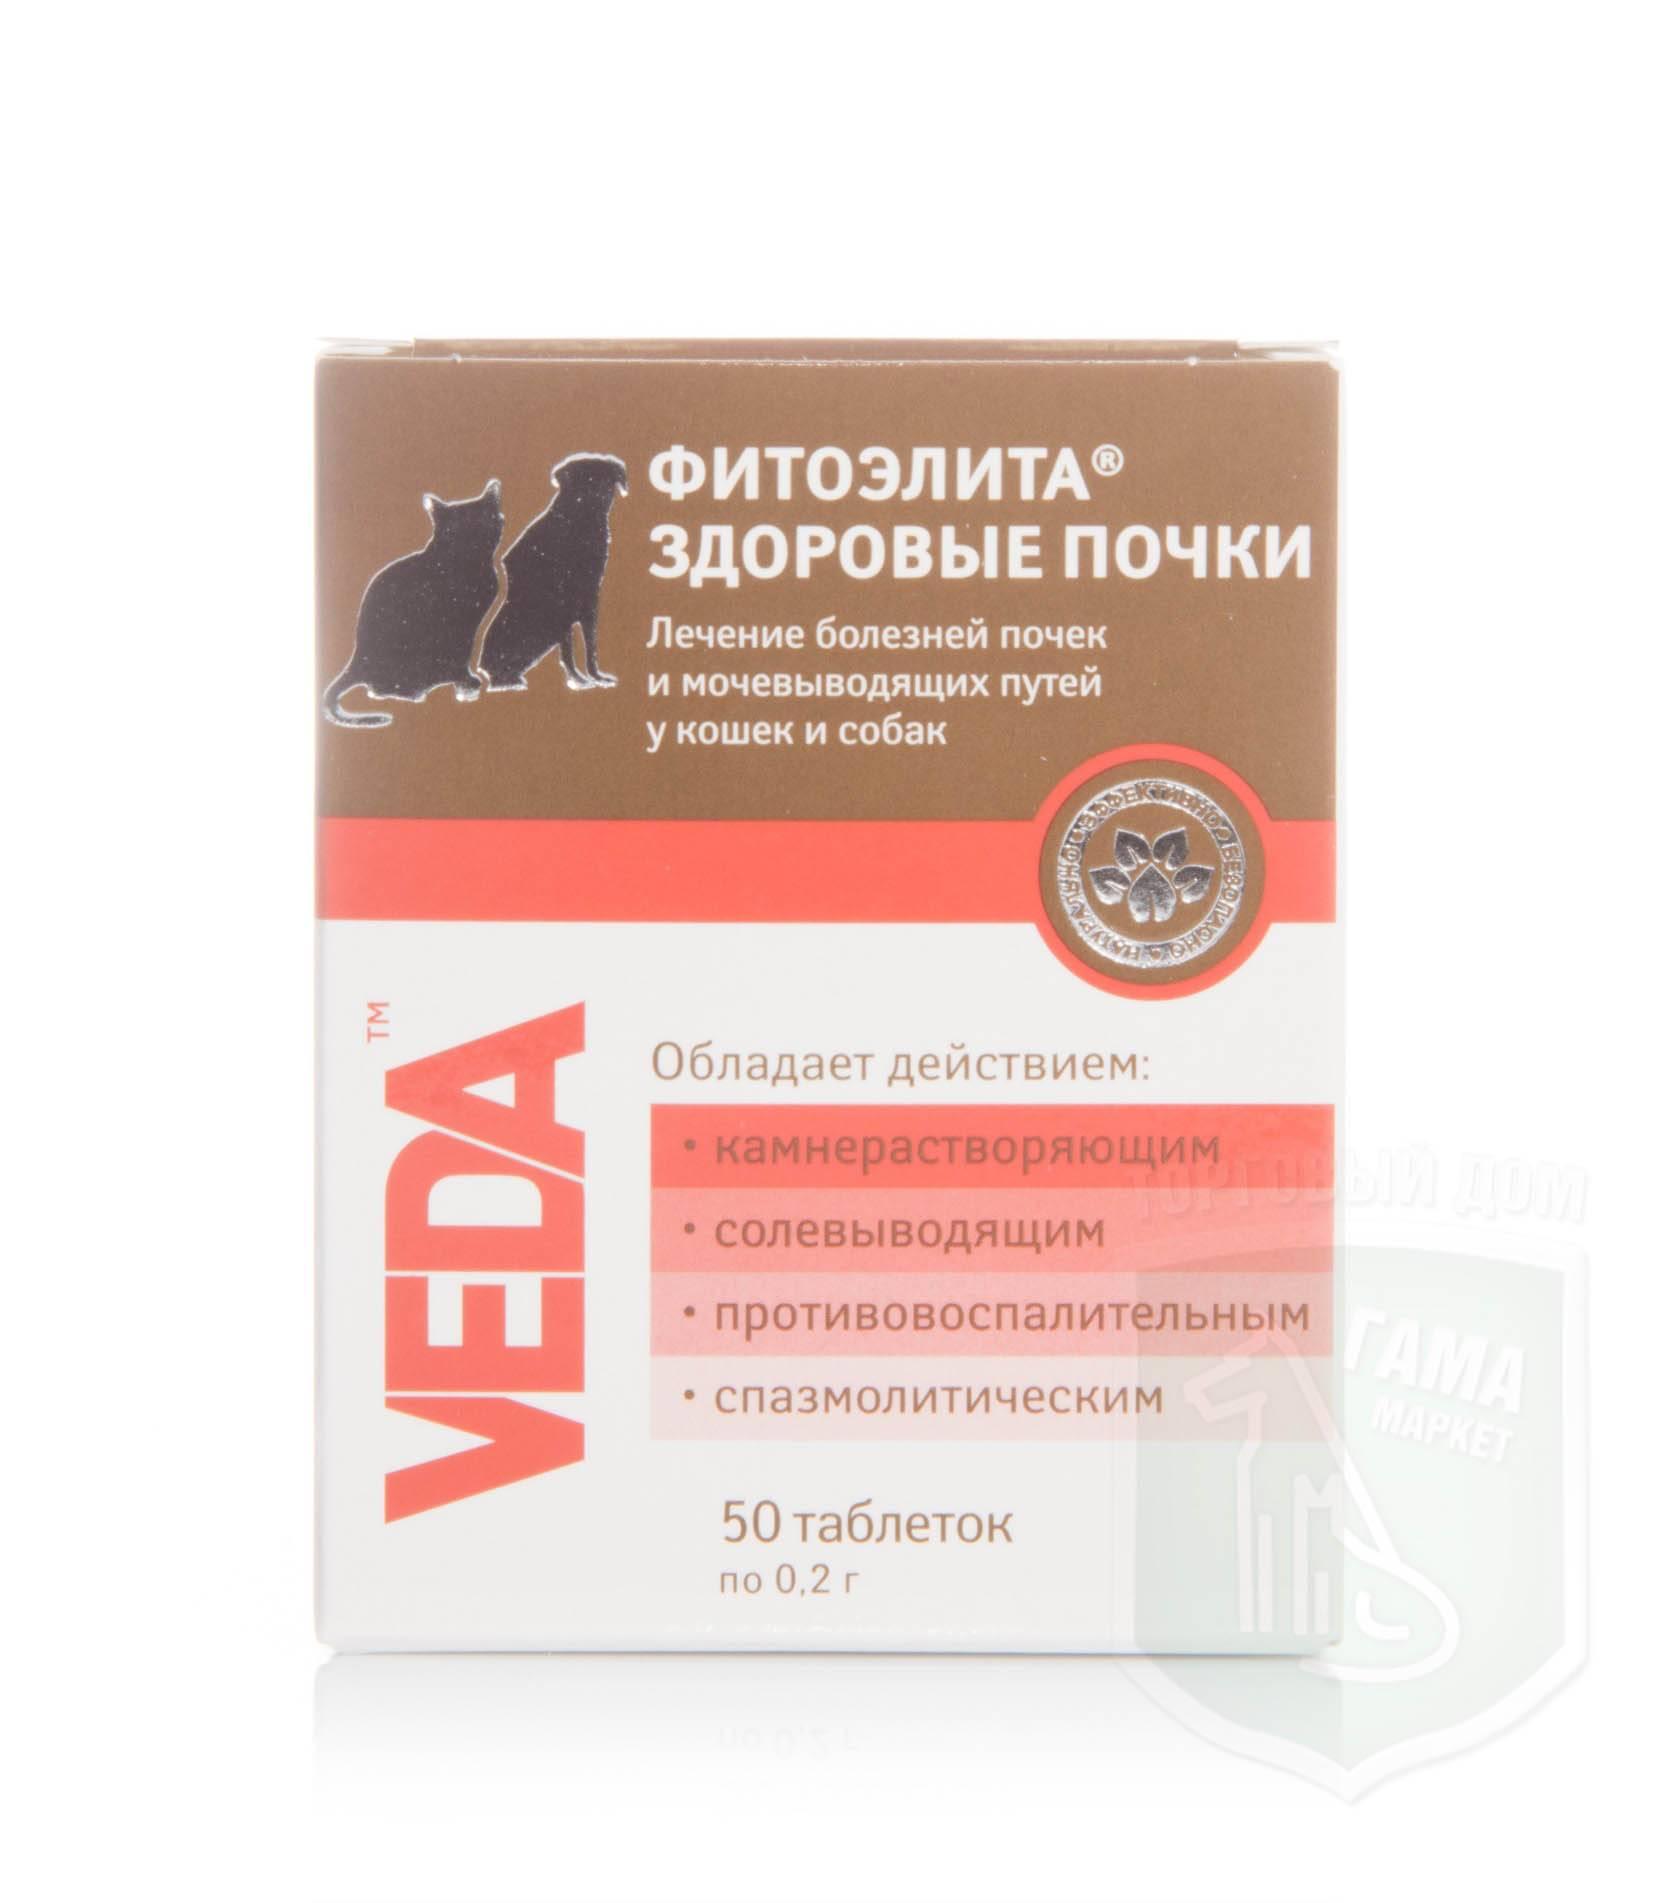 ᐉ фитоэлита здоровые почки при цистите - netmedicine.ru